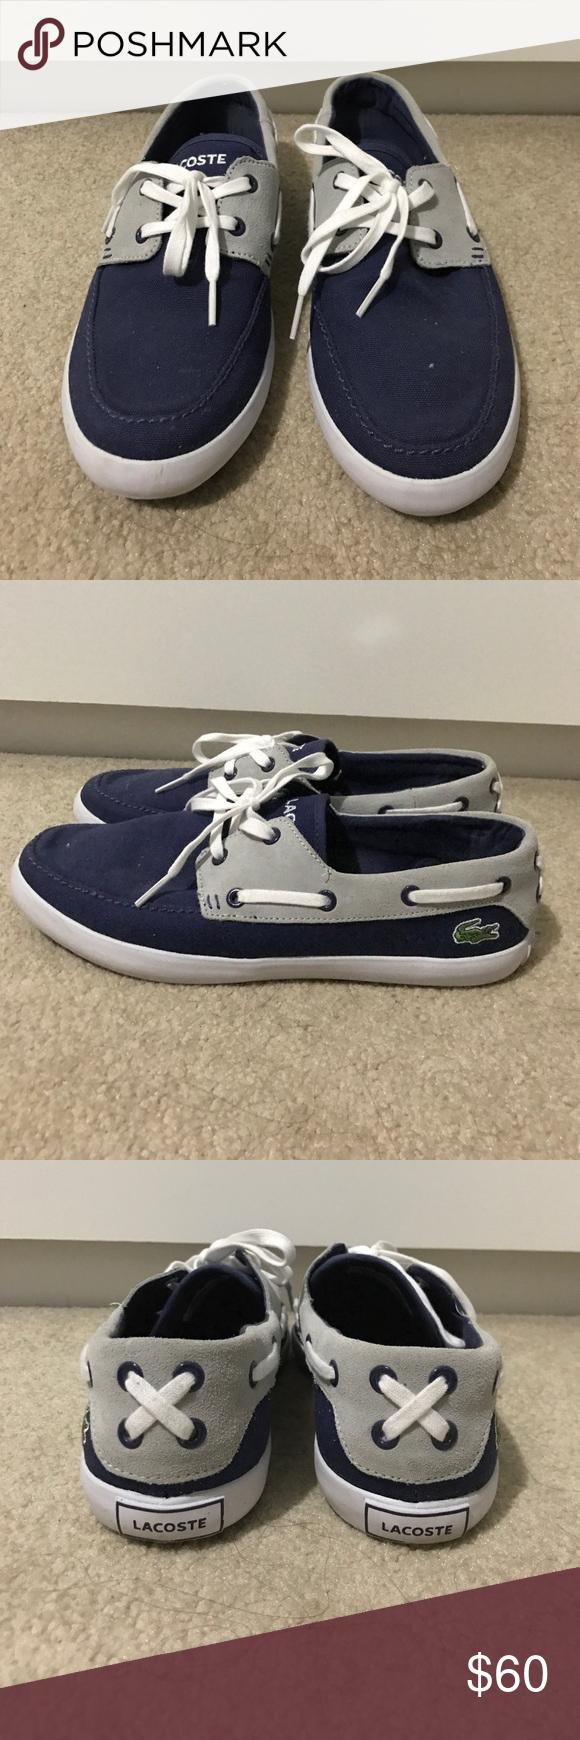 827f6333736c Lacoste Boat Shoes Women s Blue Lacoste boat shoes size 10. Worn once Lacoste  Shoes Flats   Loafers